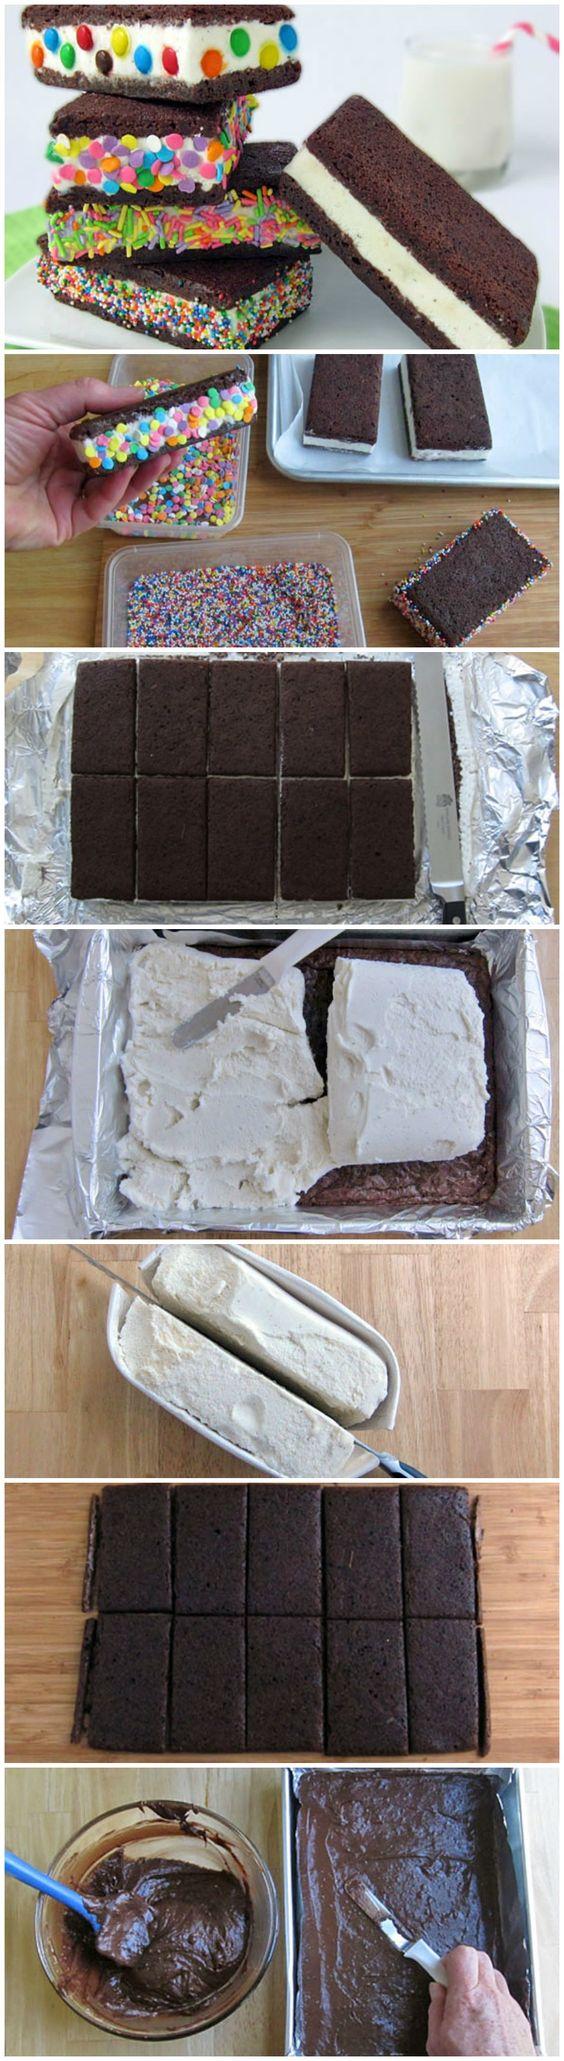 Brownie Ice Cream Sandwiches!! Must try! @alaina_edgar